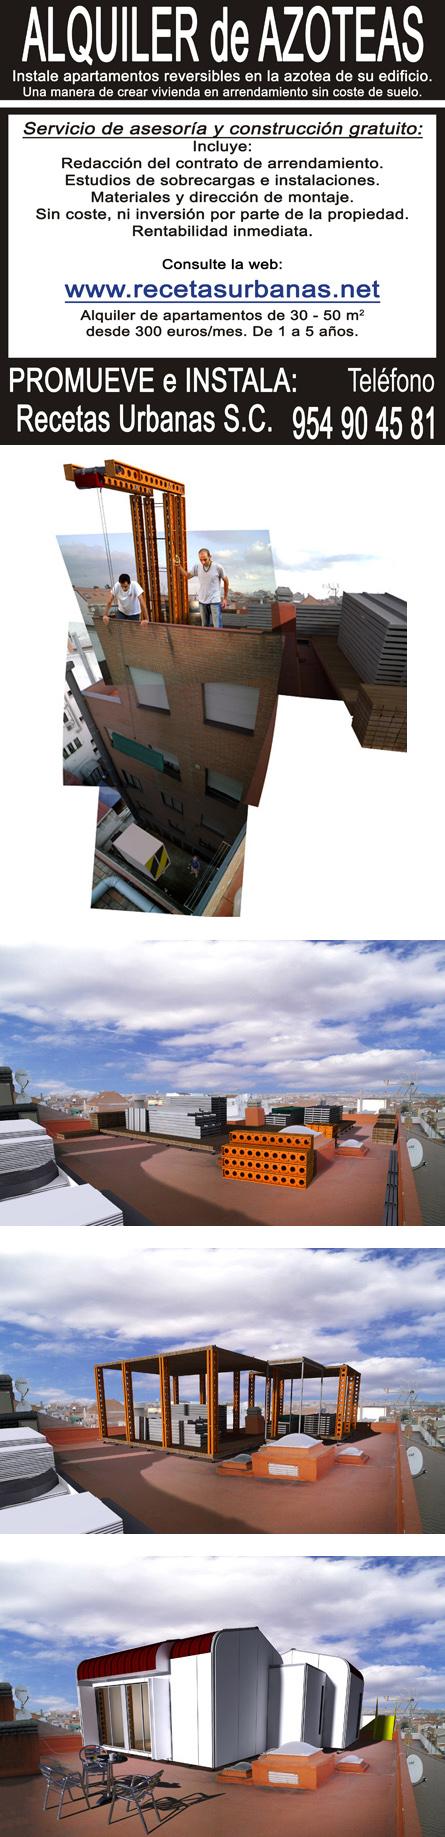 santiago cirgeda recetas urbanas modulo vivienda azotea